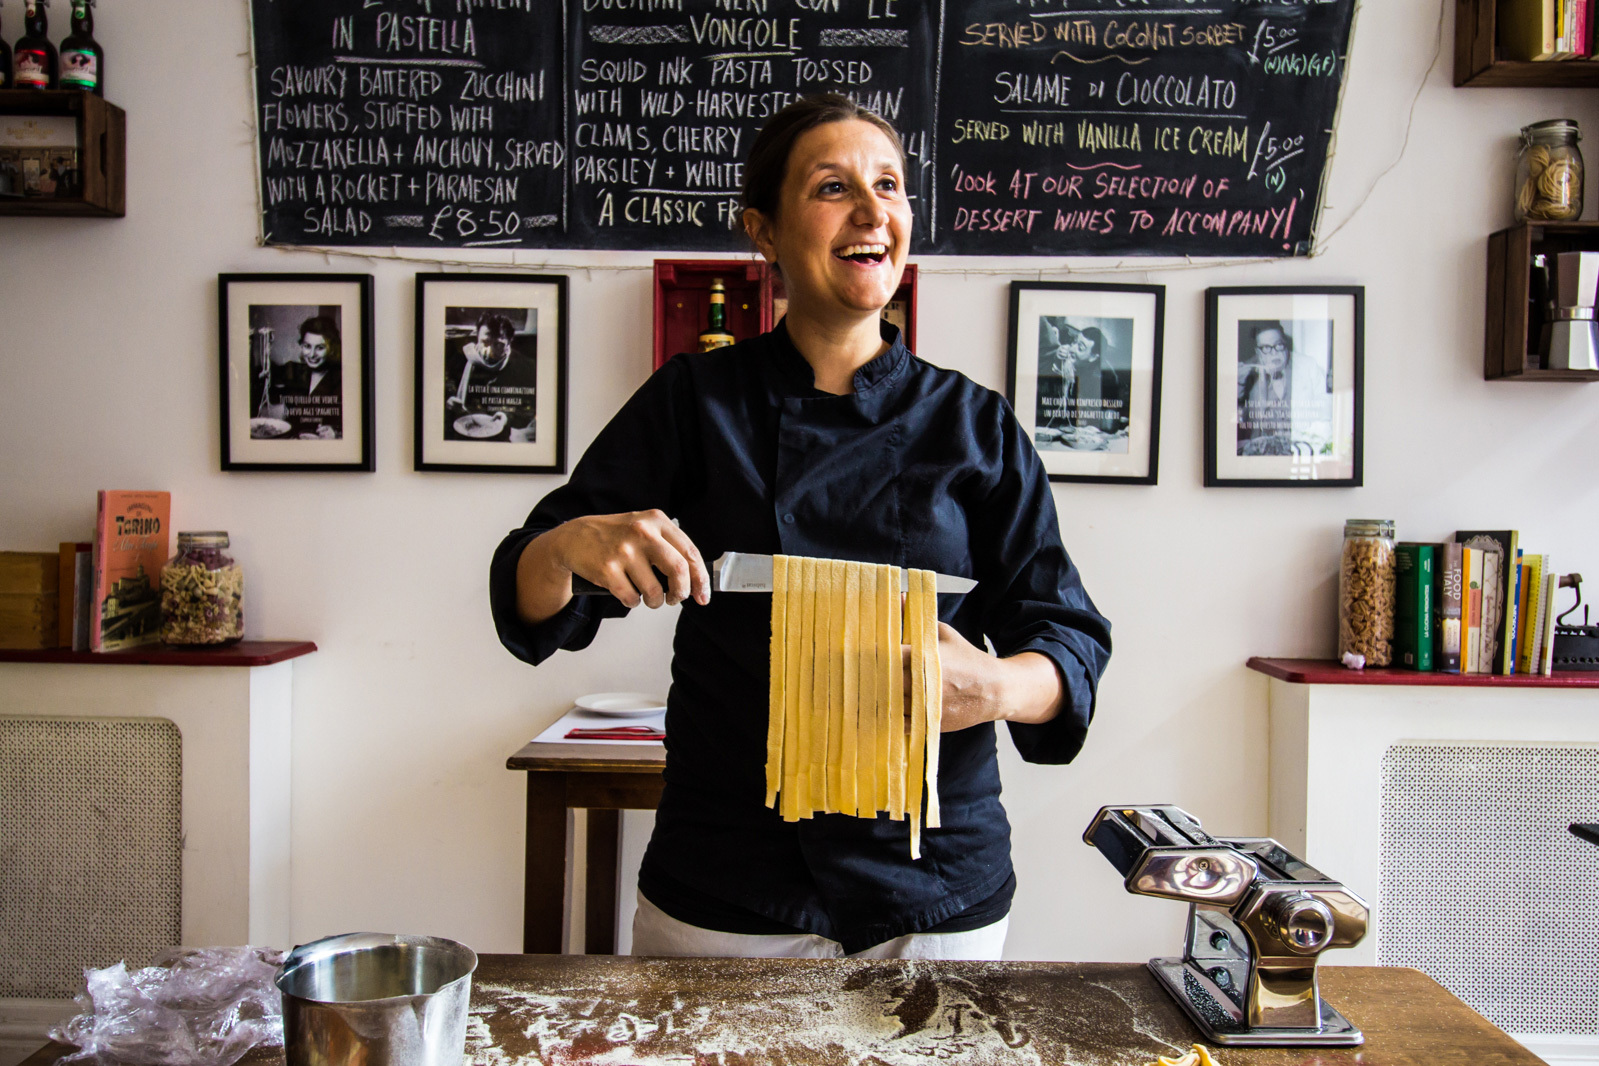 20180718 Pasta Factory Julia Making Bucatini 2